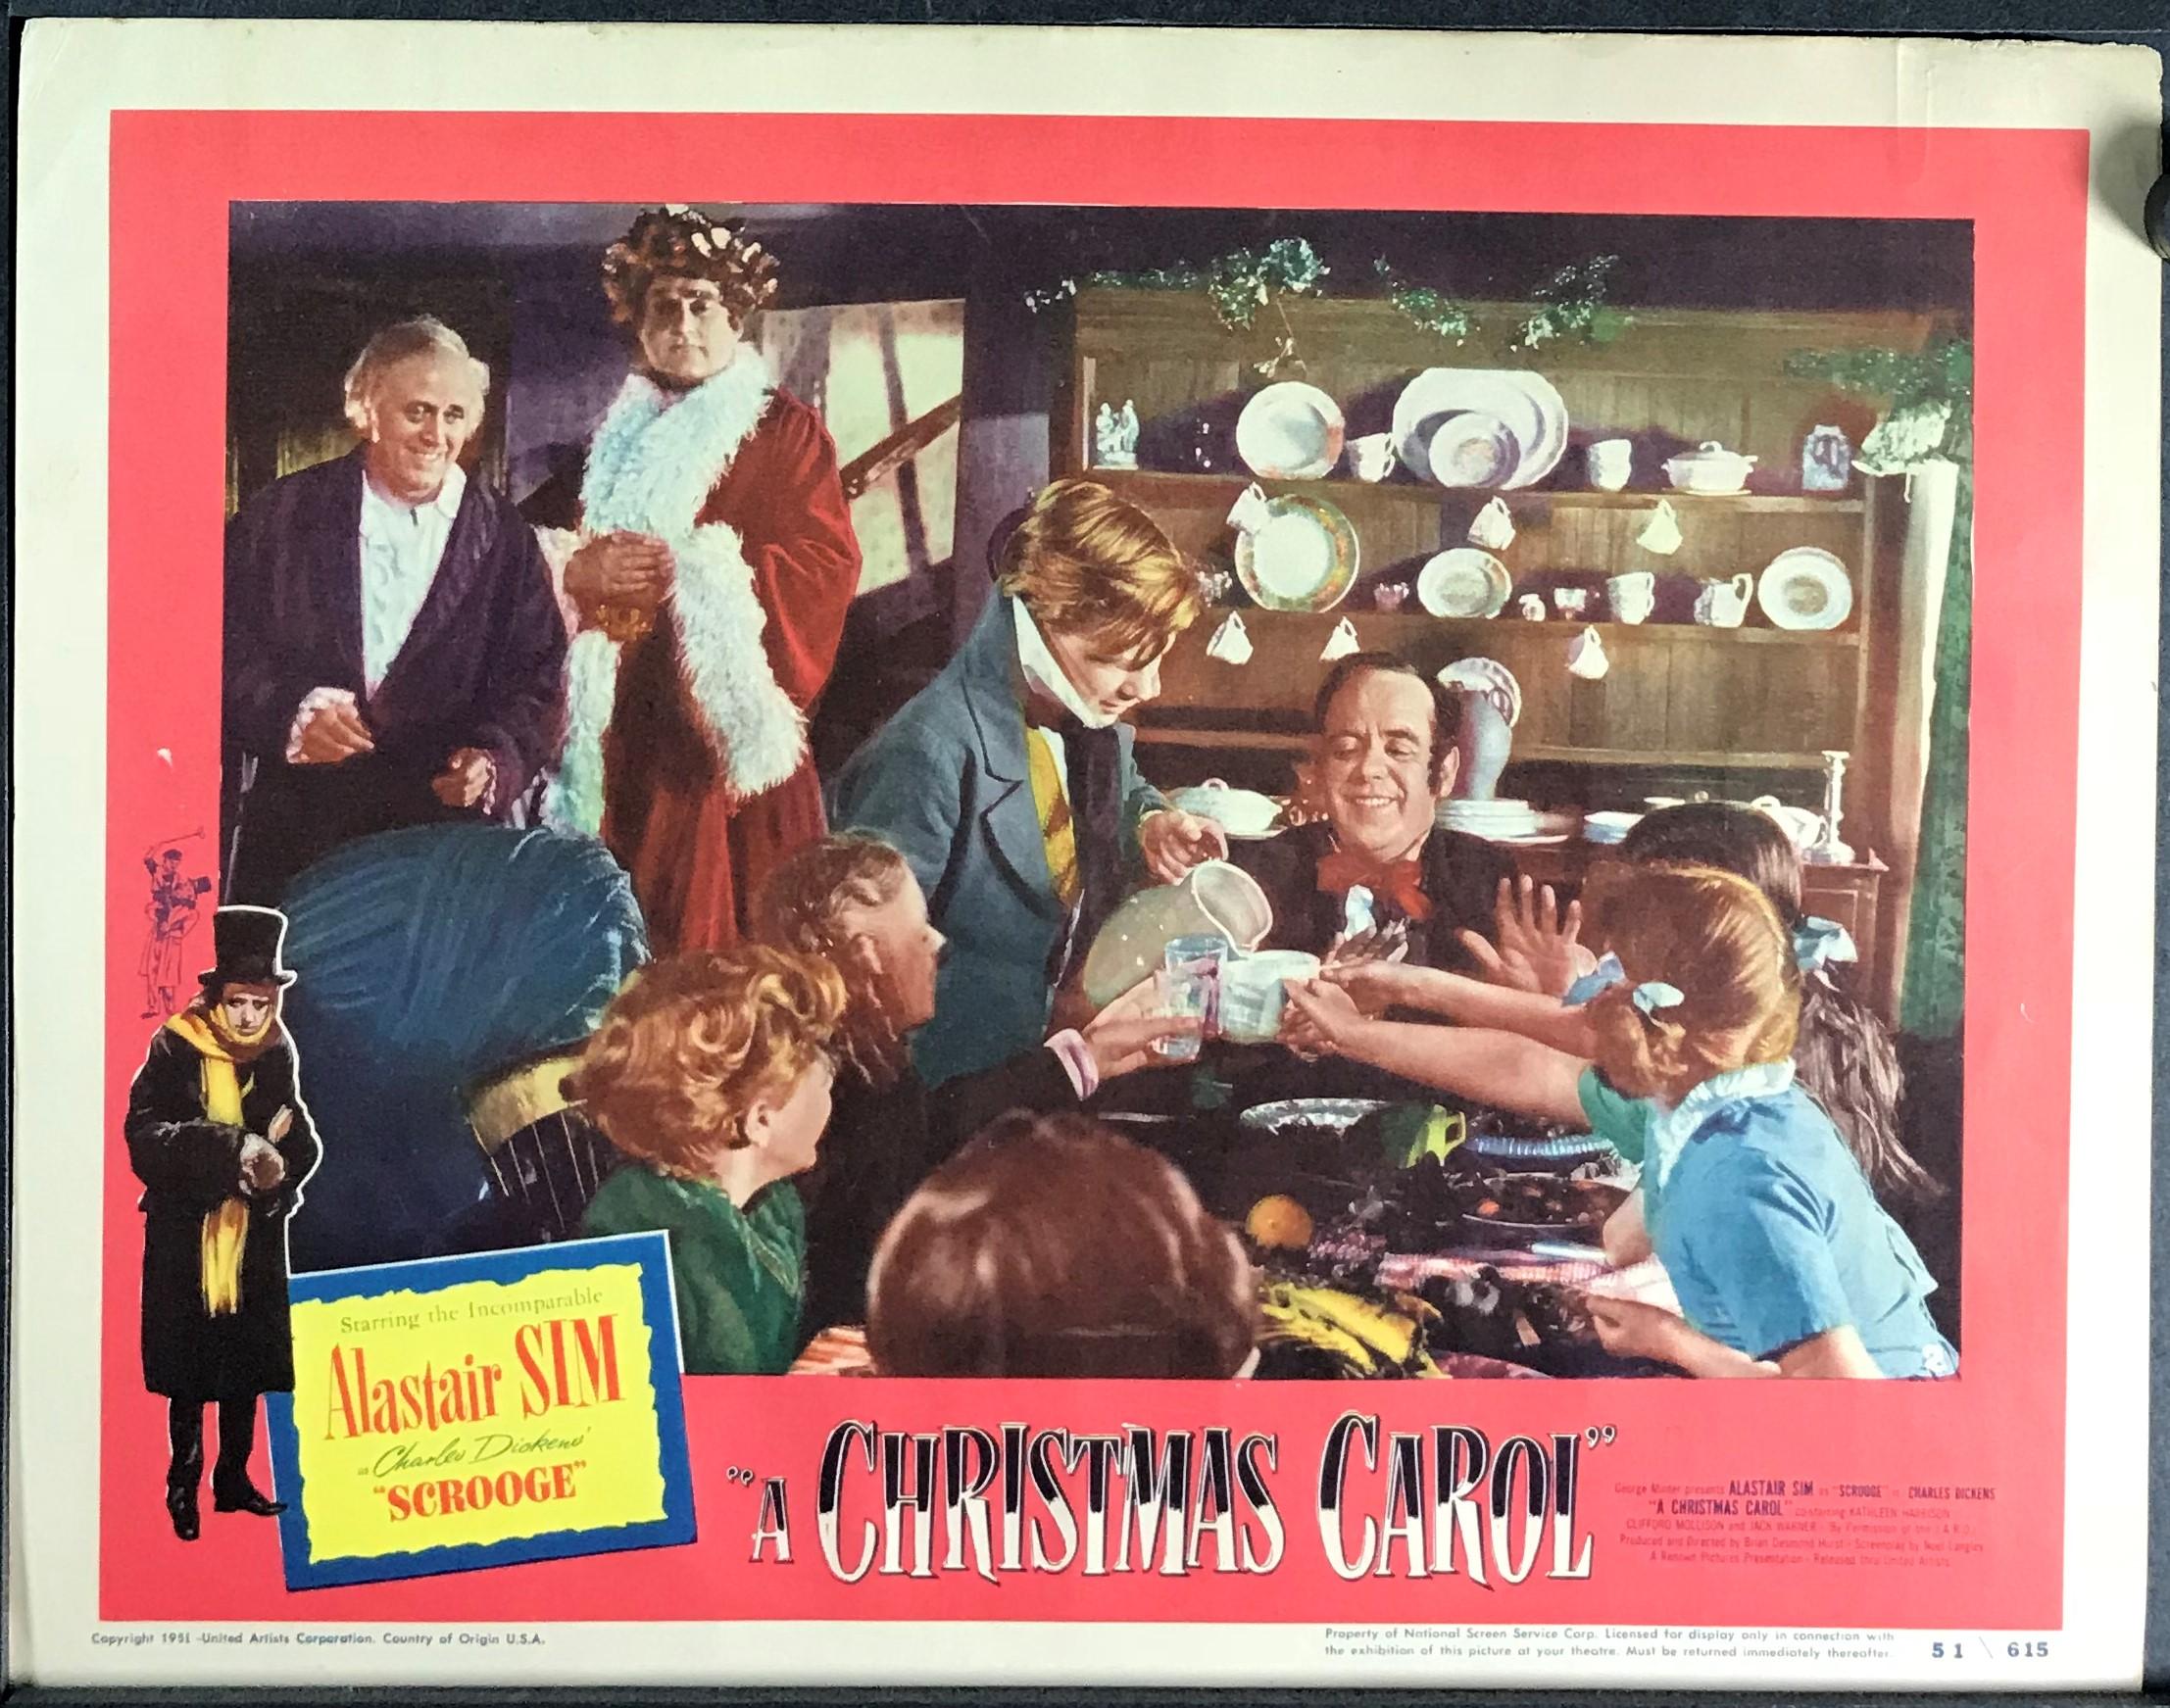 Original Christmas Carol Movie.A Christmas Carol Original Vintage Charles Dickens Movie